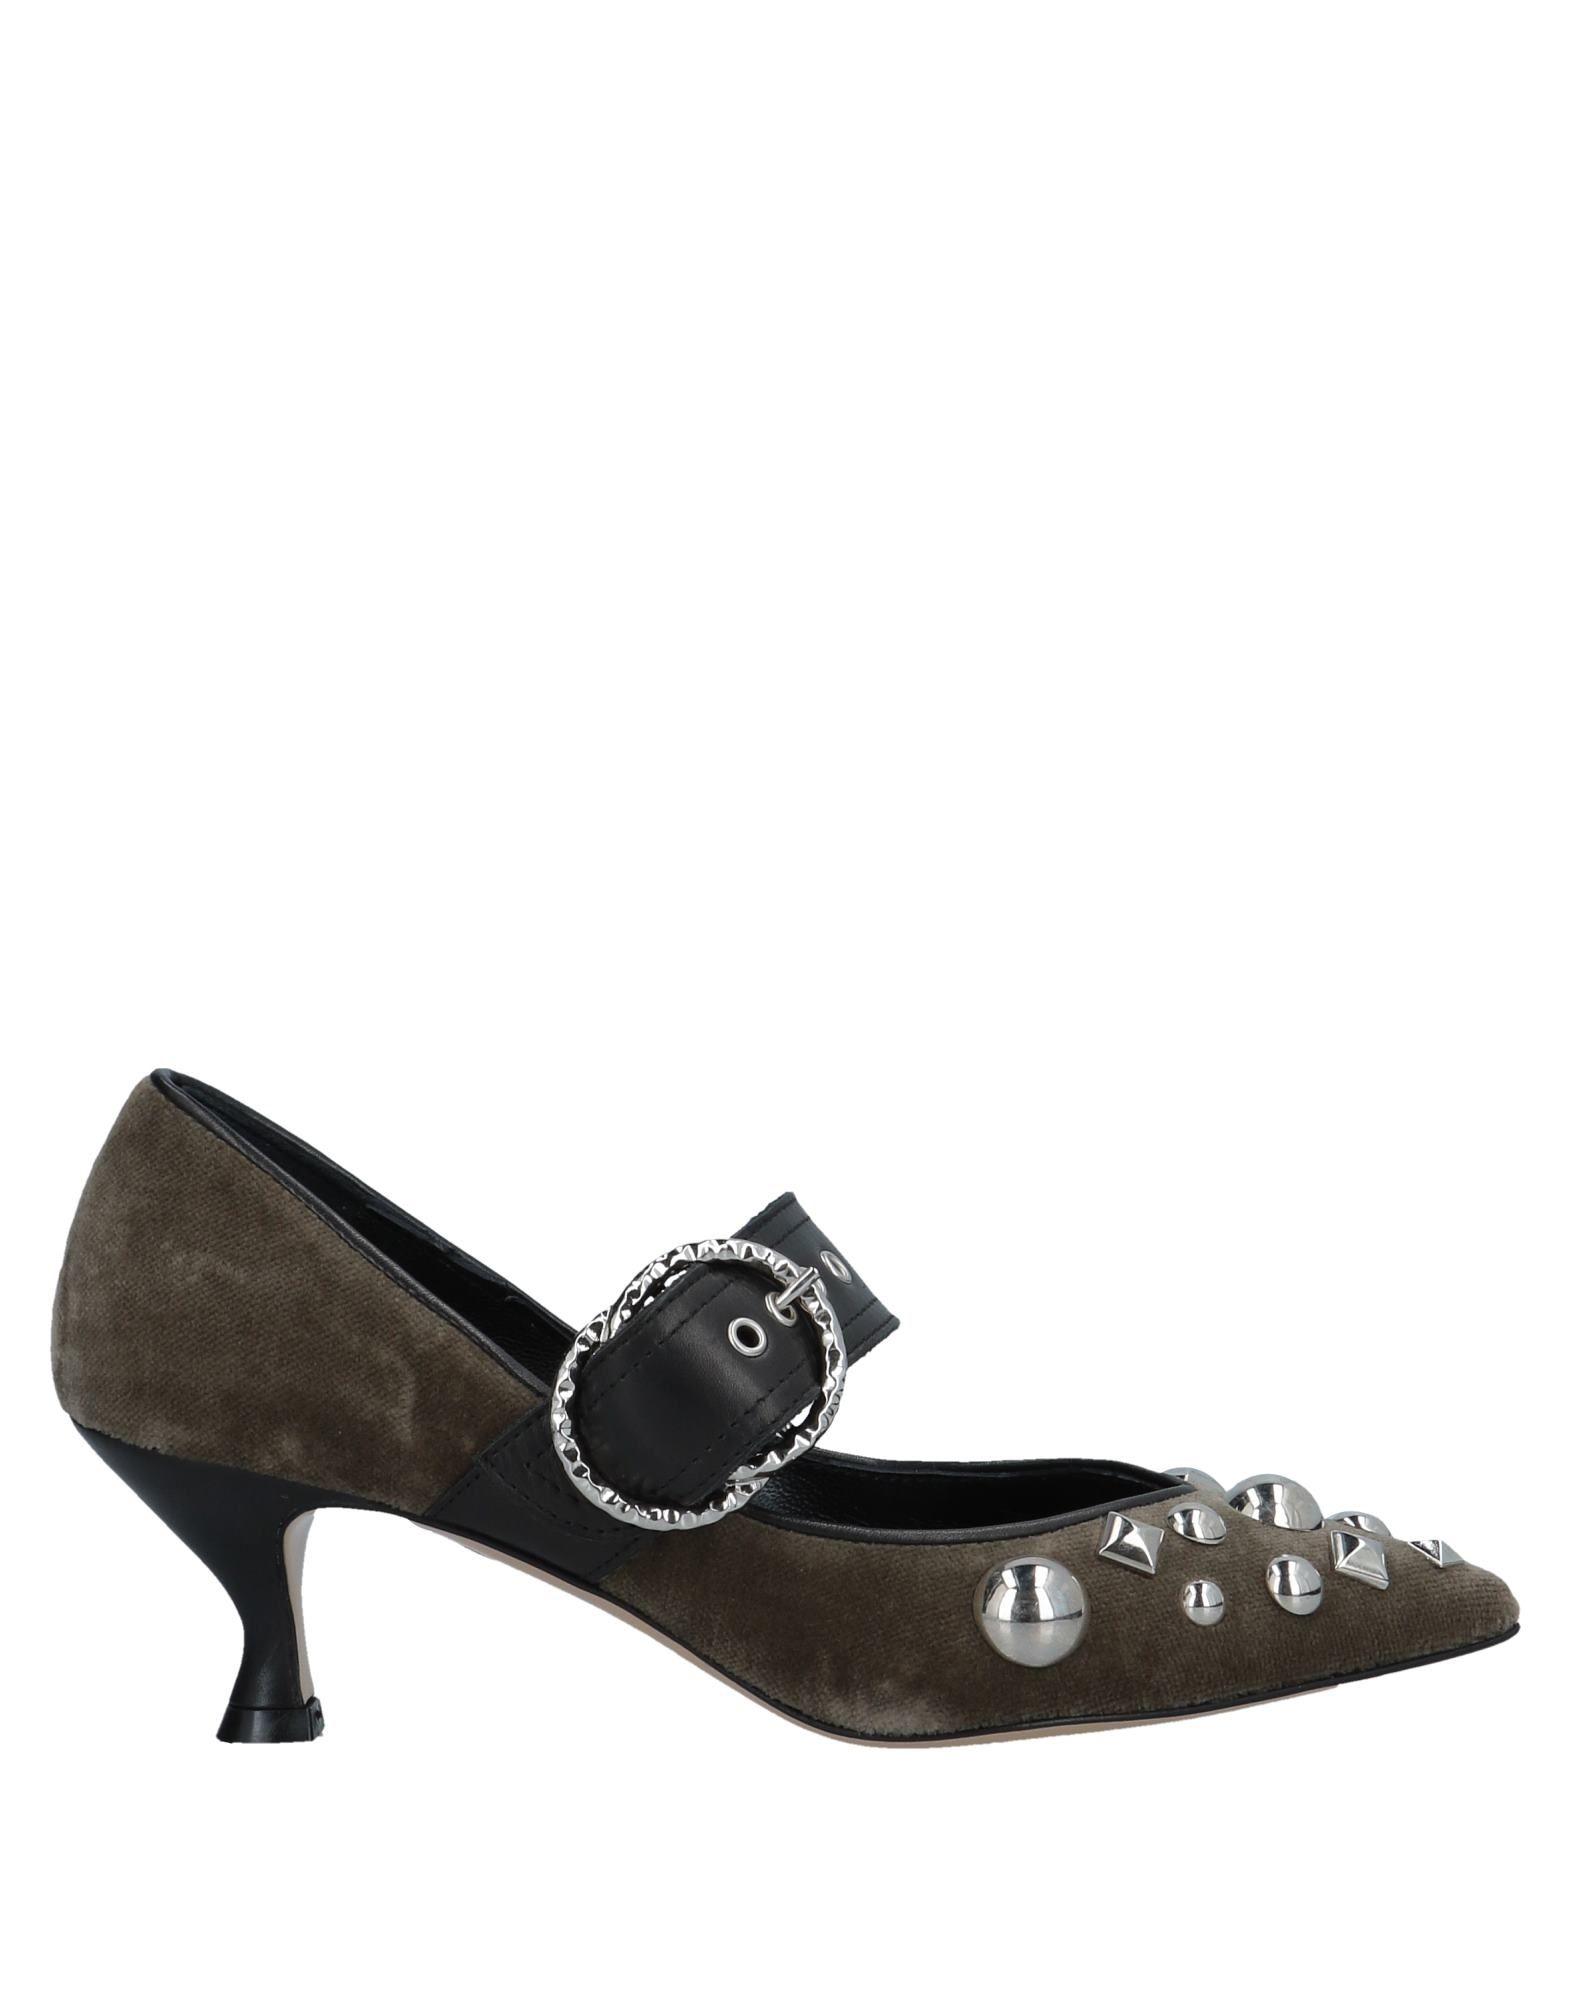 Mivida Mivida Mivida Pumps Damen  11550368PE Gute Qualität beliebte Schuhe 857dde